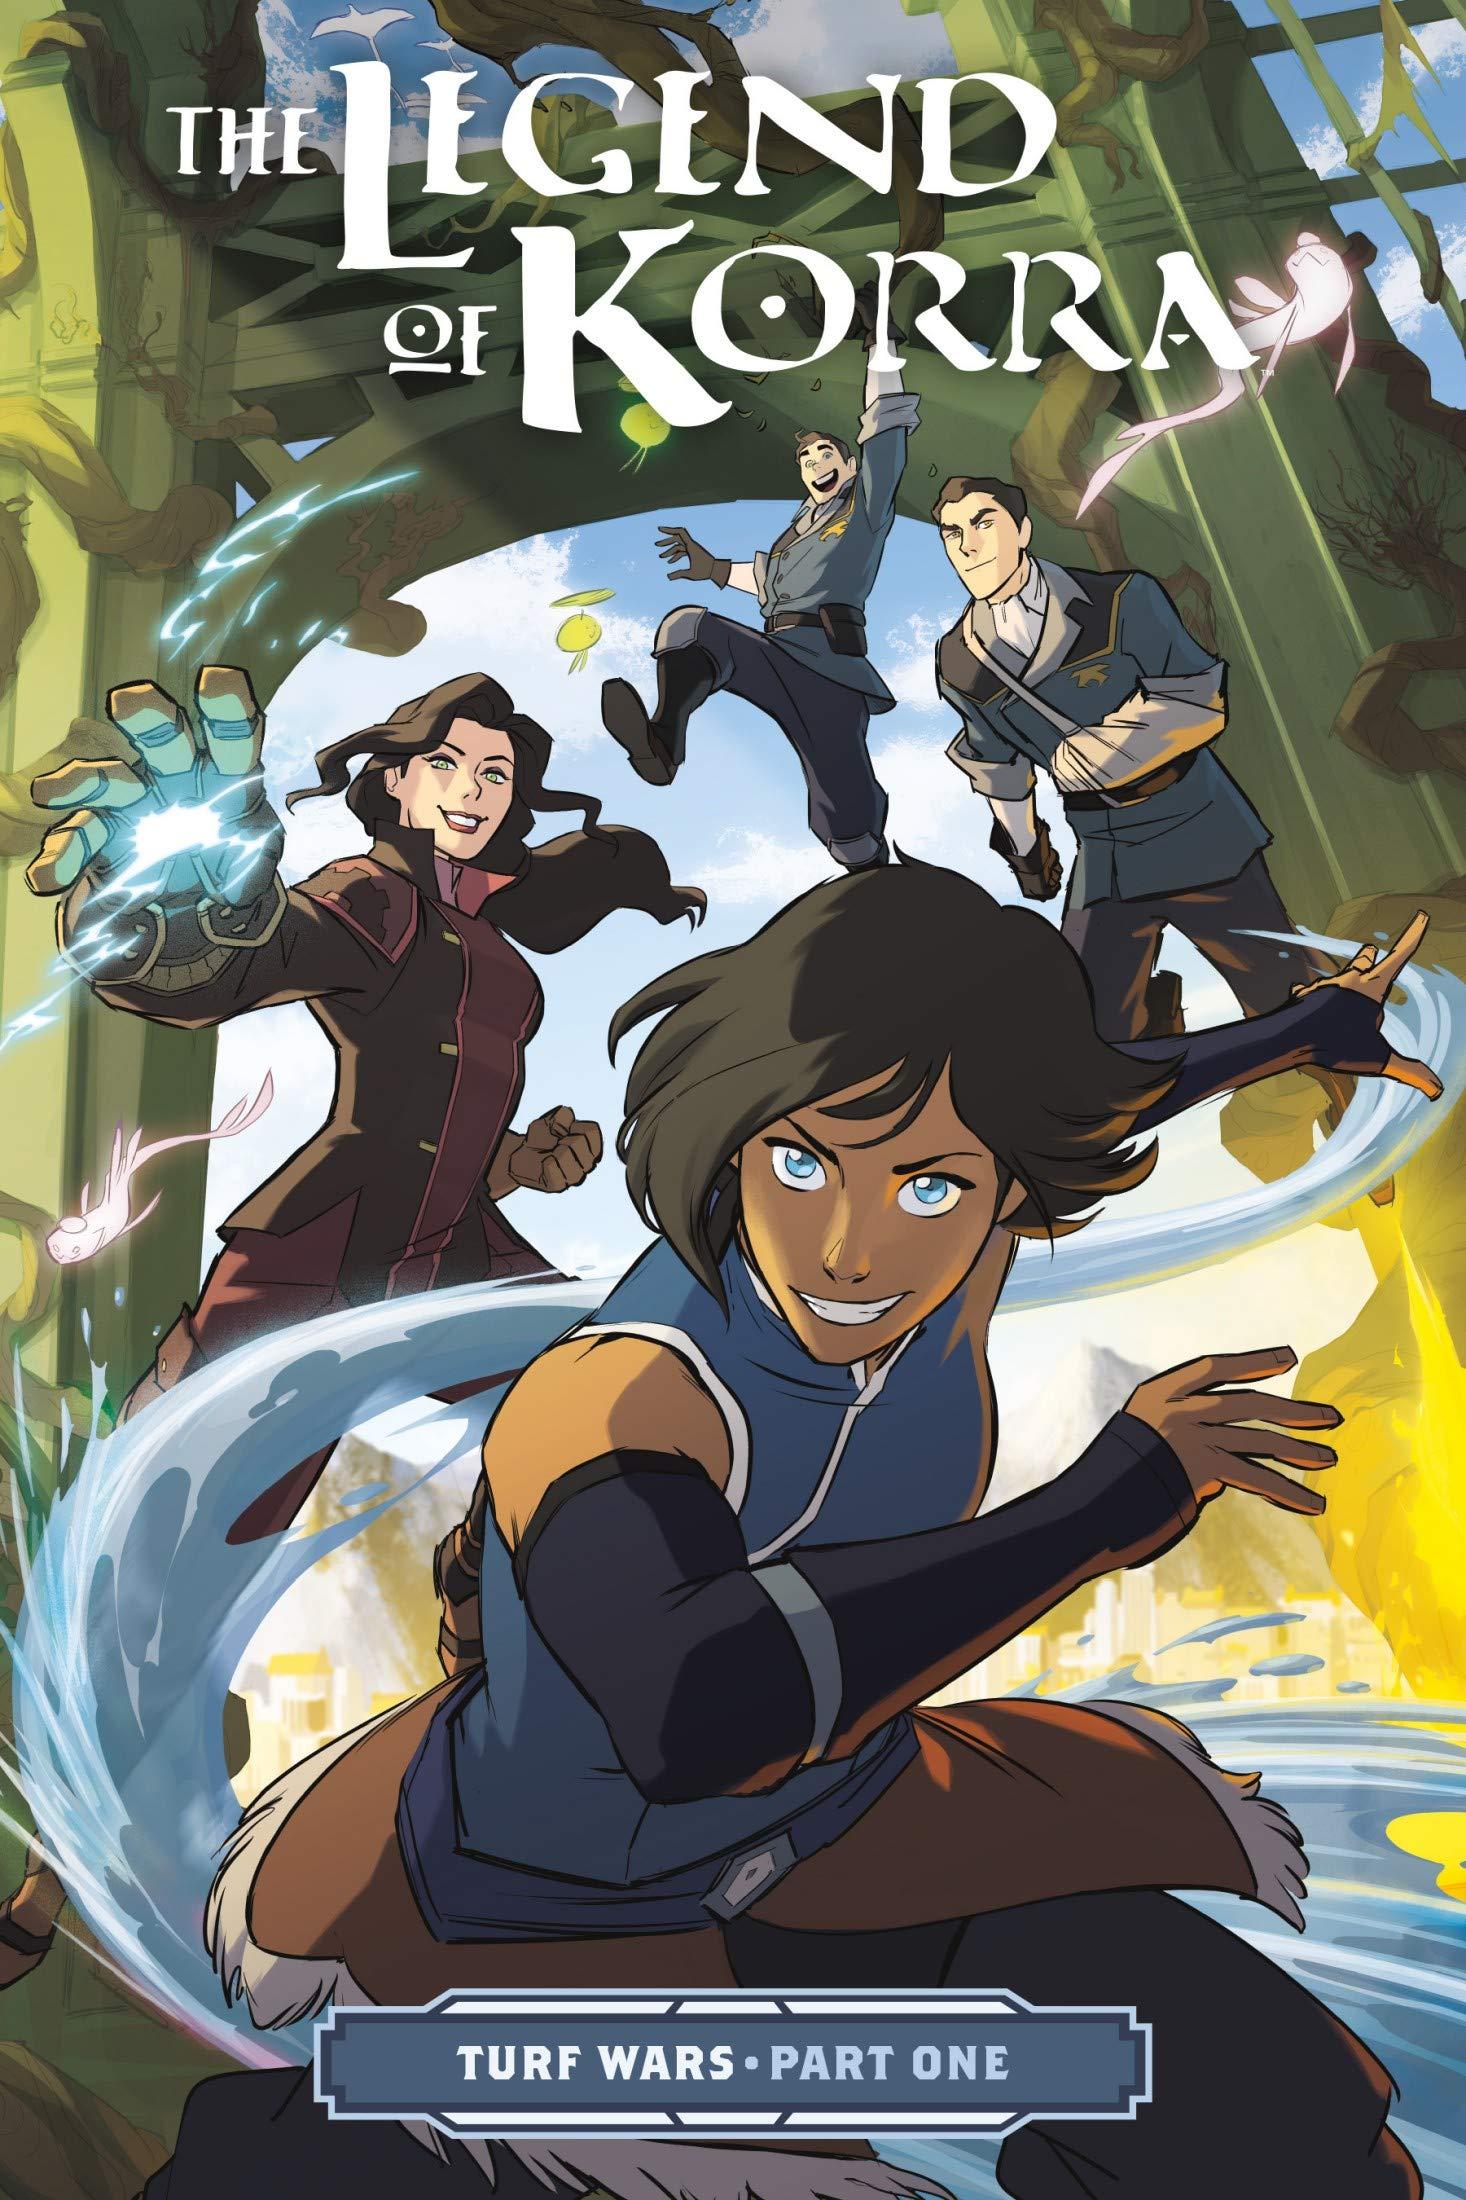 Korra: Legend - Vol 5 Great Adventure Comic Avatar The Legend Graphic Novels Of Korra For Young & Teens , Adults